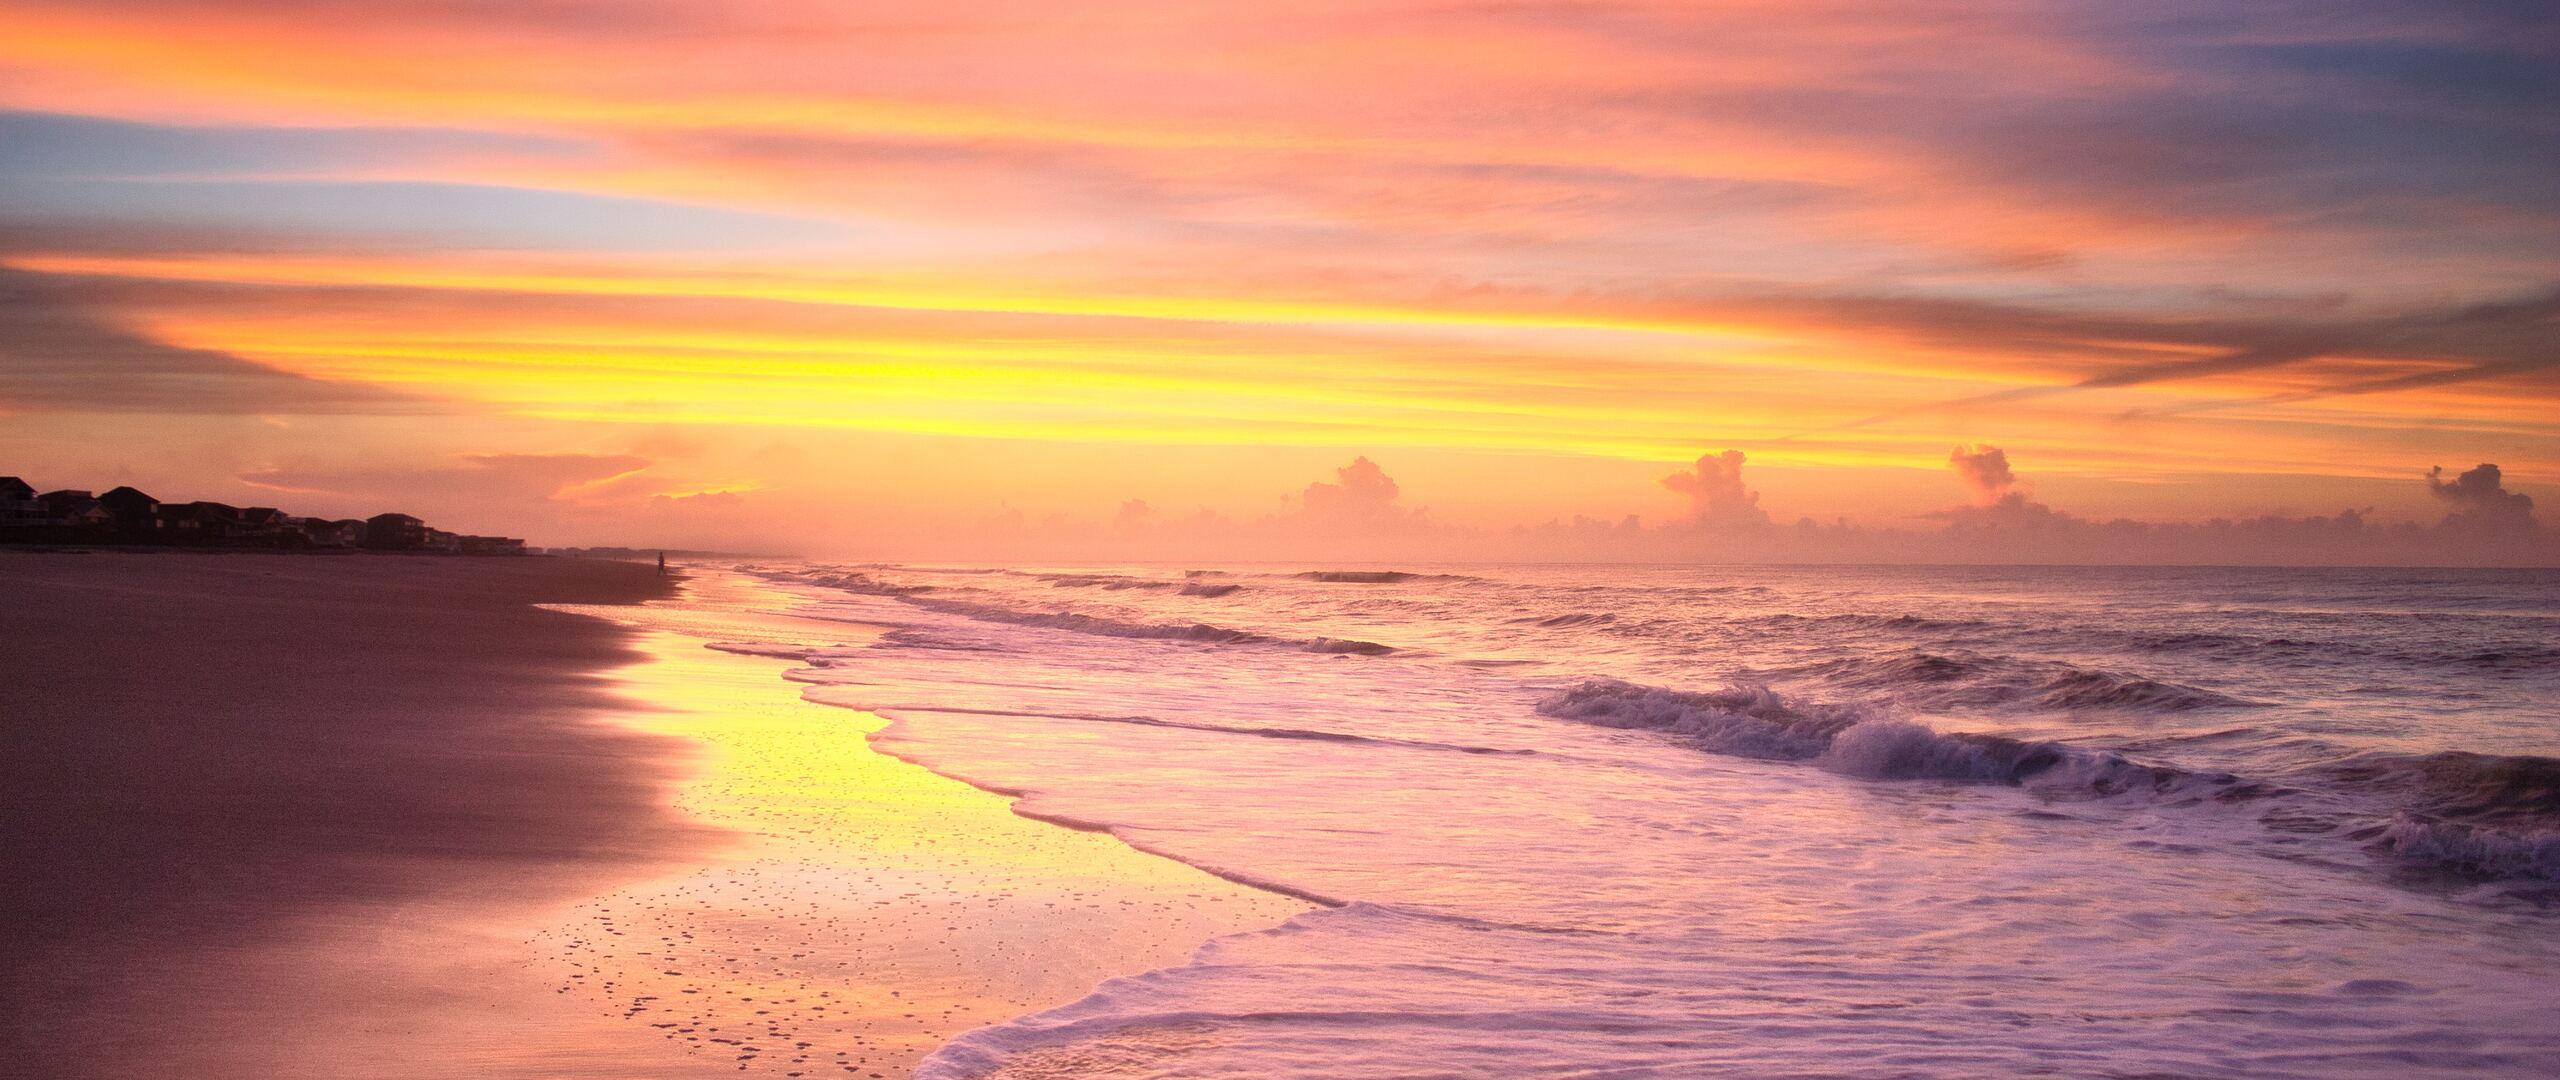 sunrise-on-the-beach-in-the-summer-time-at-ocean-isle-beach-4k-ga.jpg